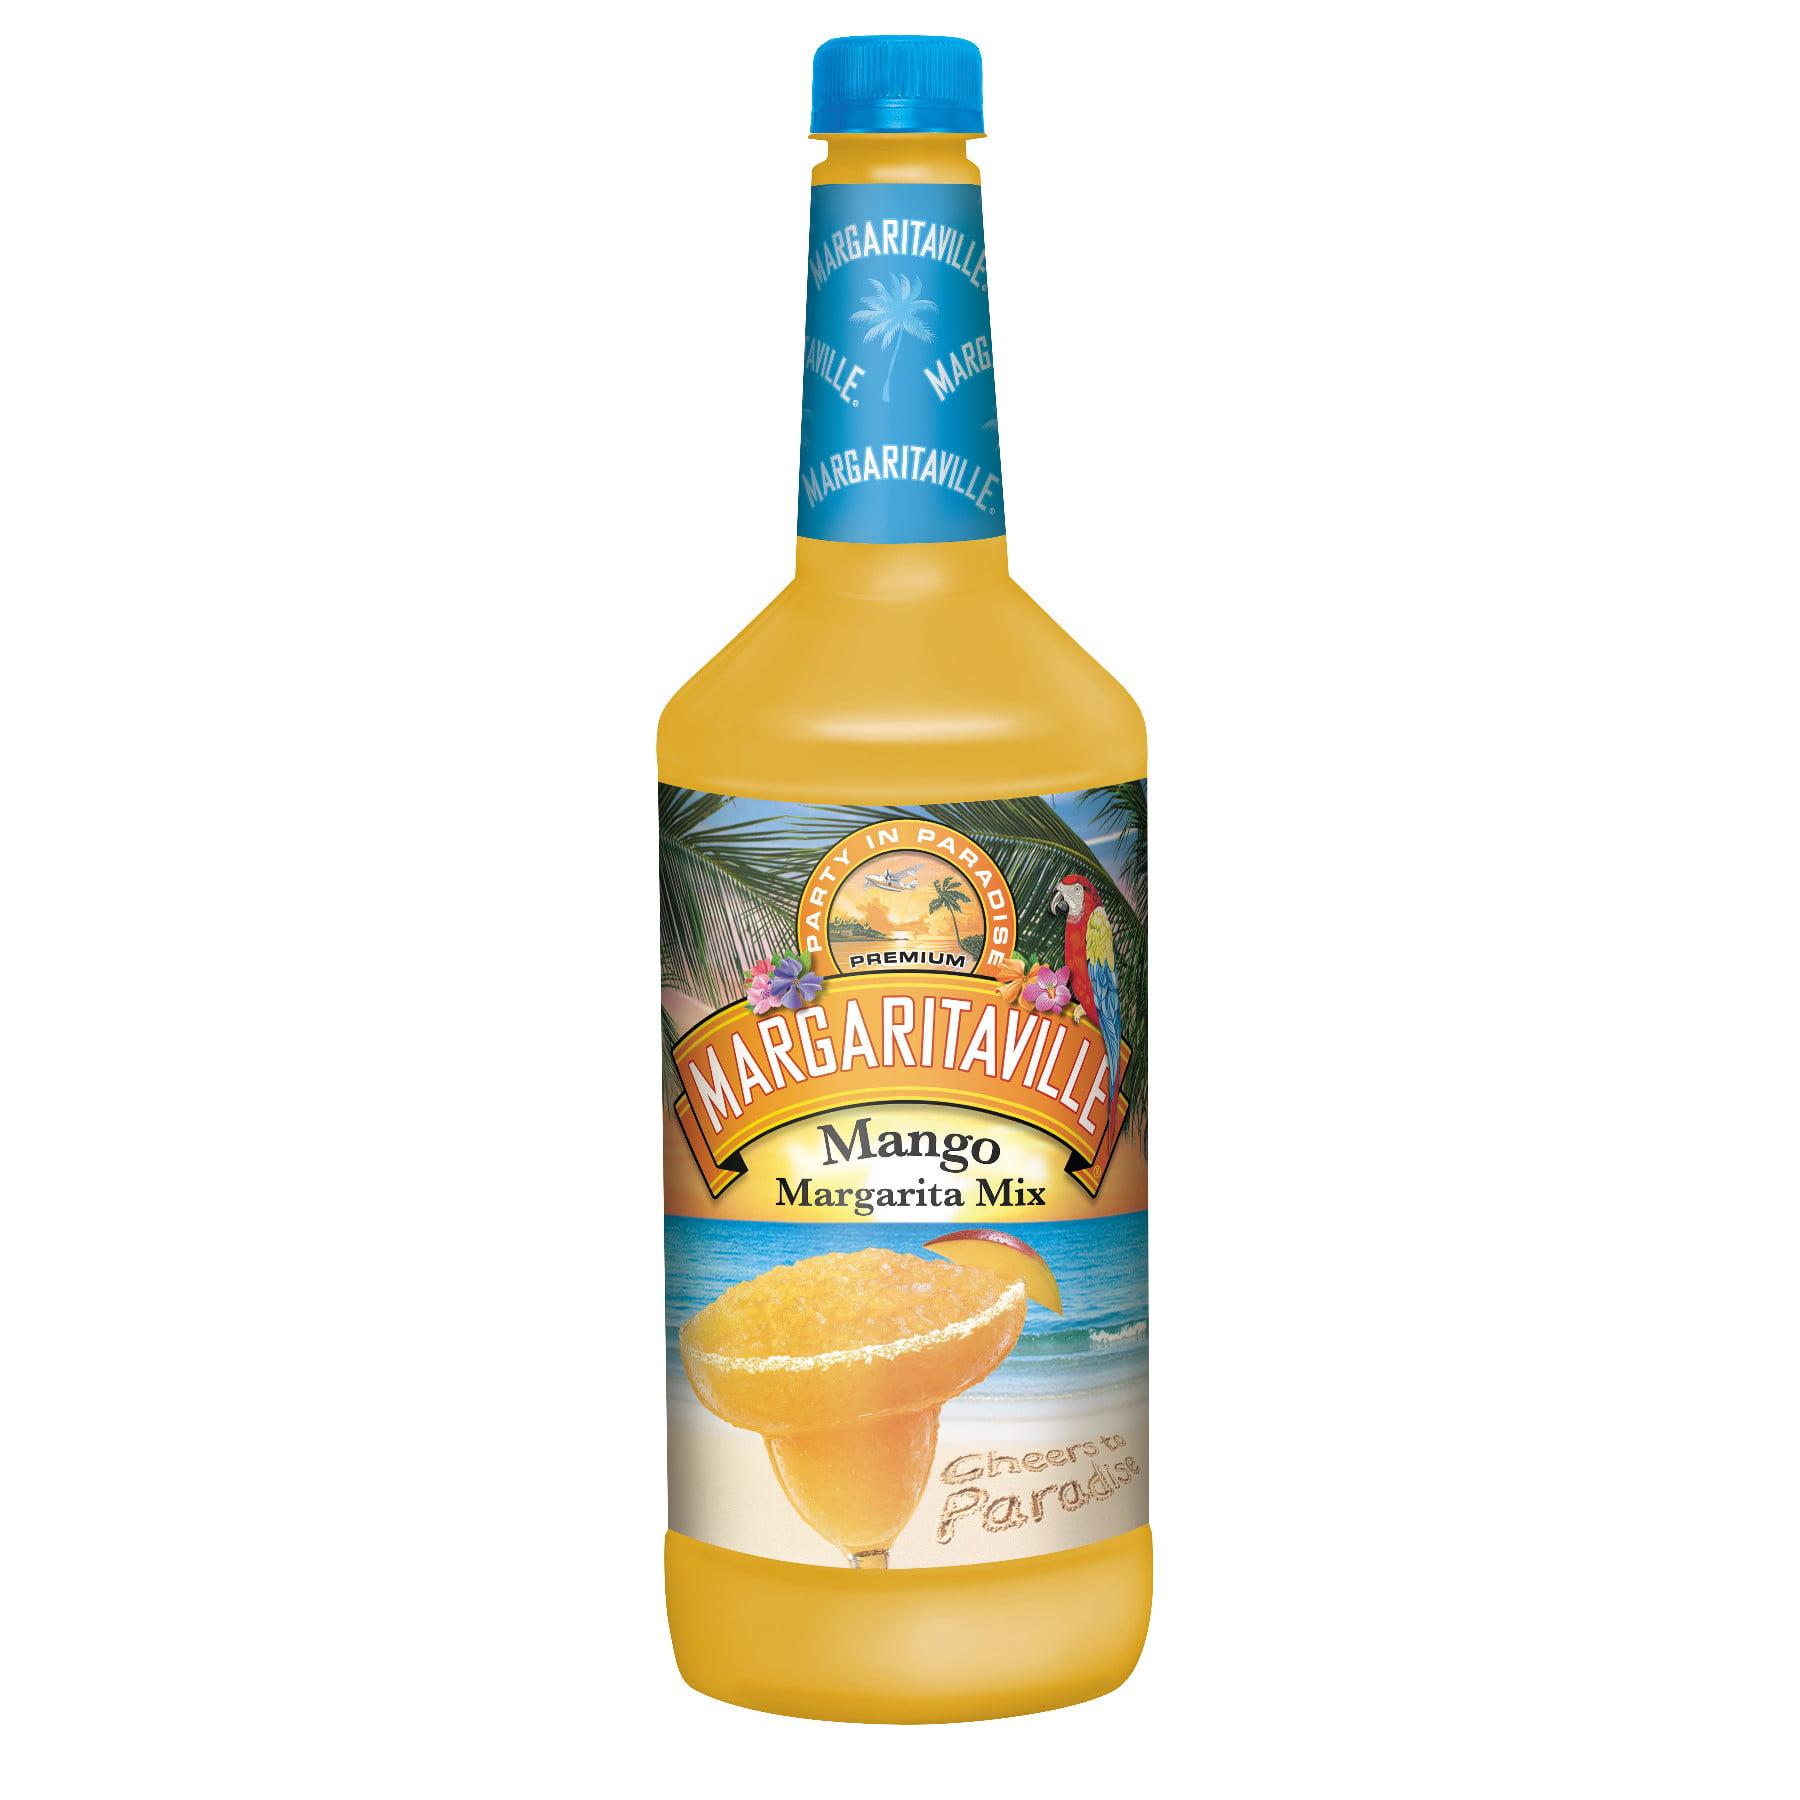 Margaritaville Ready To Drink Mango Margarita